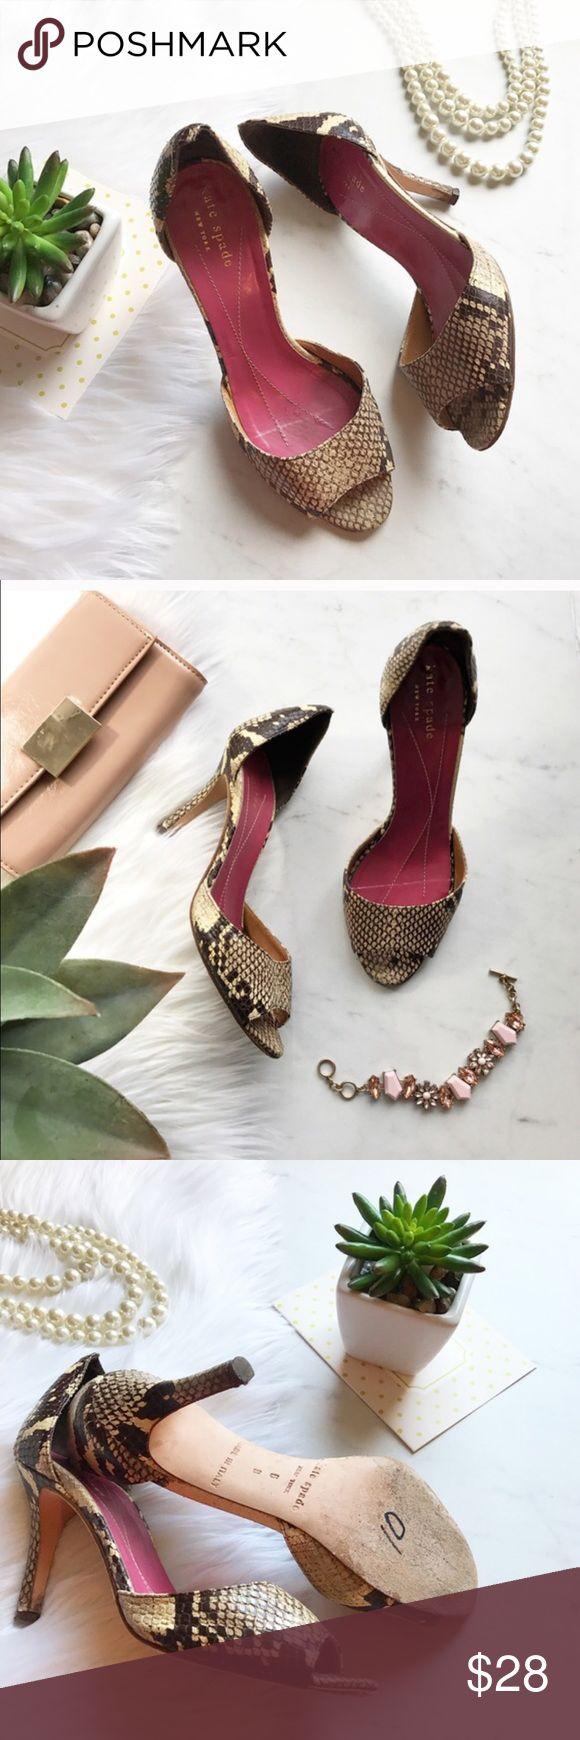 Kate Spade sandals Animal print heels , worn but still in good shape. Pet & smoke free home! kate spade Shoes Heels